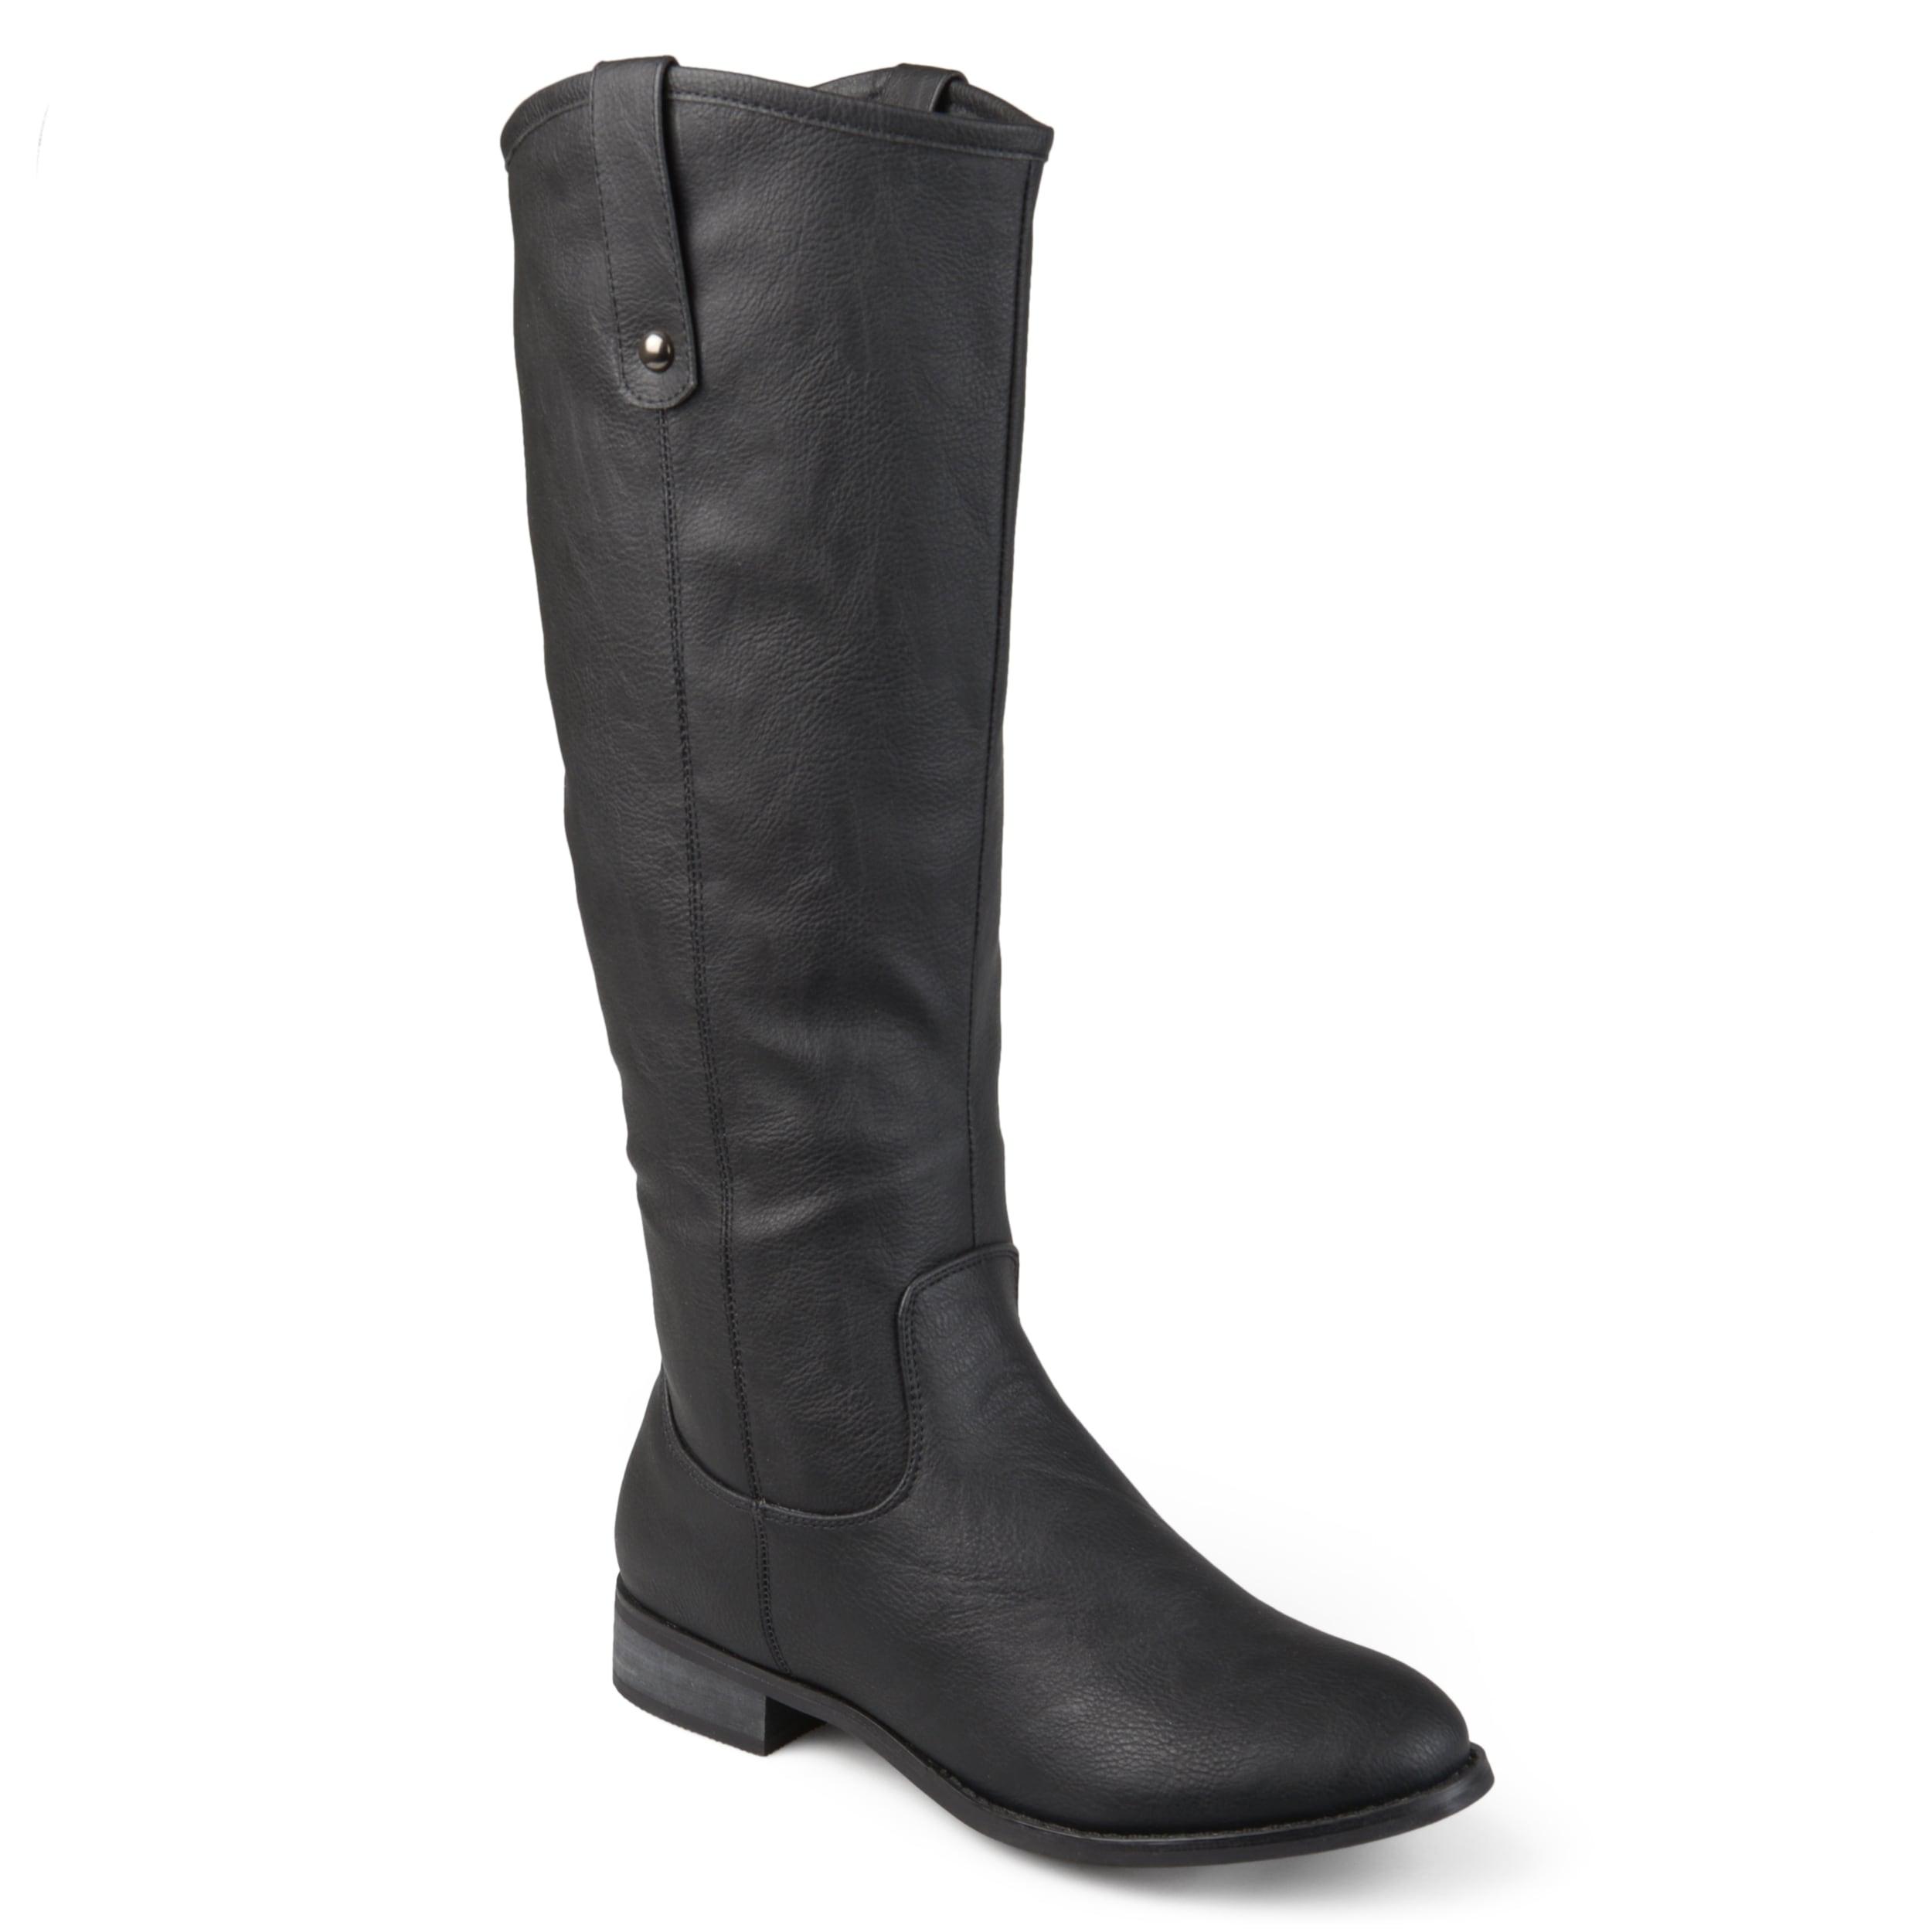 Looks - Calf wide boots for women cheap video